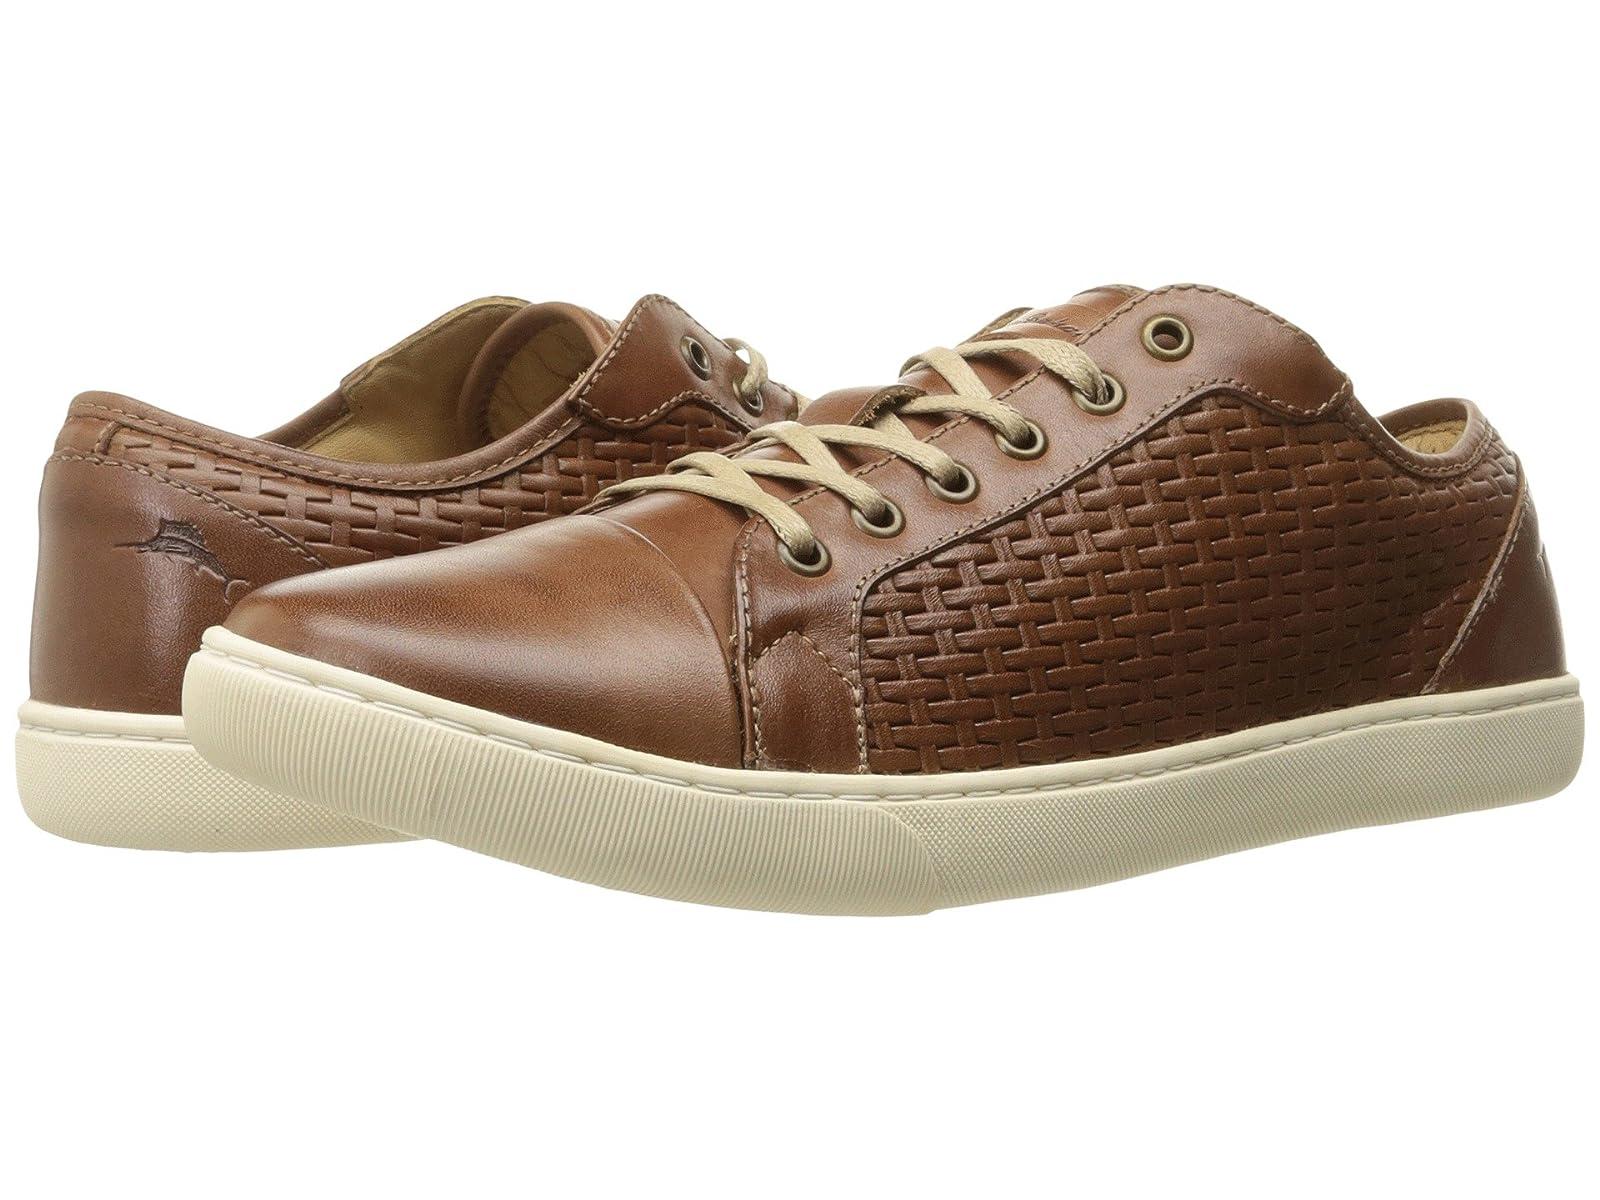 Tommy Bahama Ultan Woven CaptoeCheap and distinctive eye-catching shoes